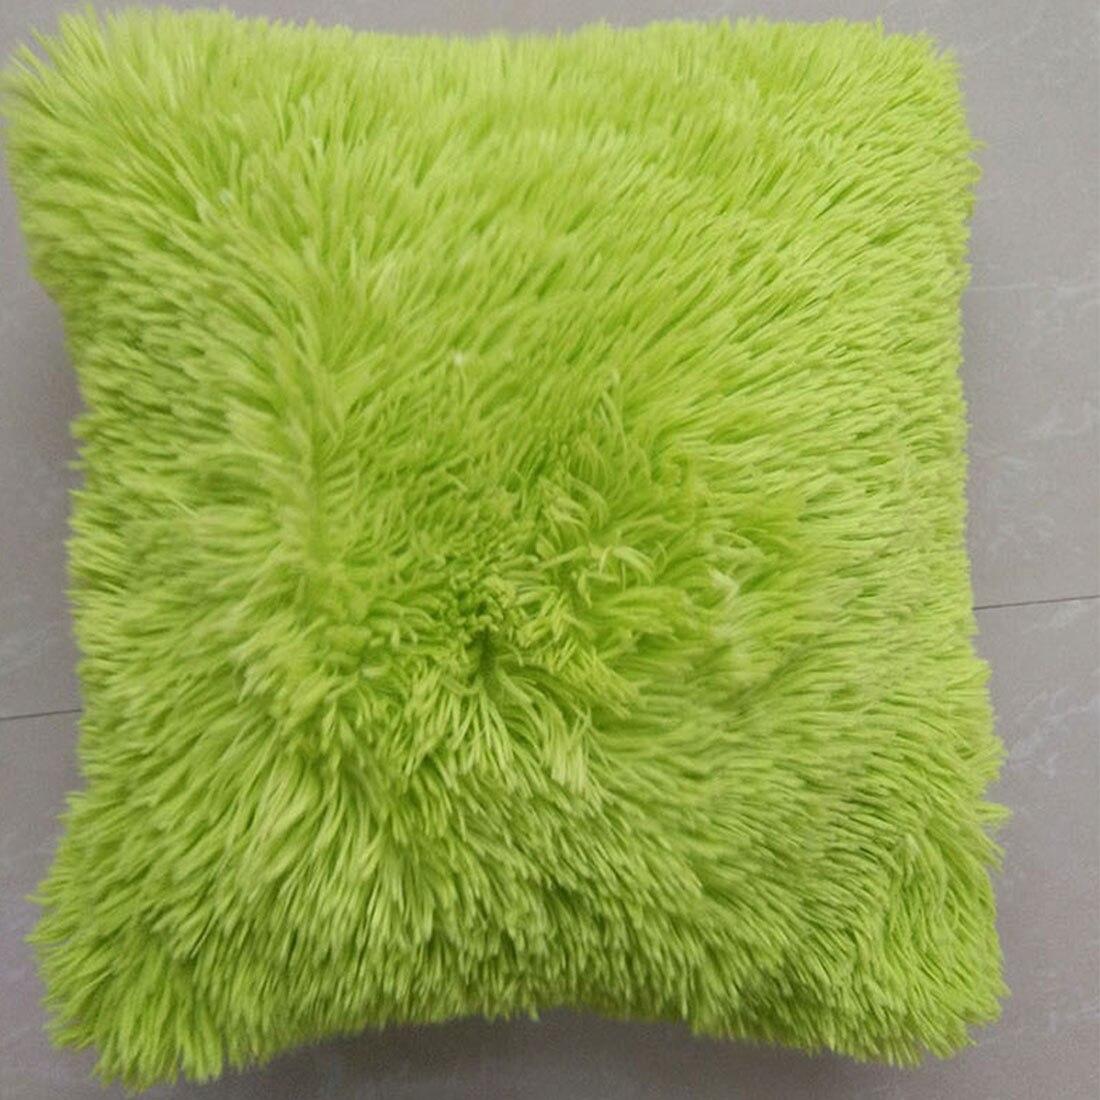 Top Sale Perfect designs Mongolian Faux Fur Pillow Cover Cushion throw pillow Case Natural Color 45 x 45 cm